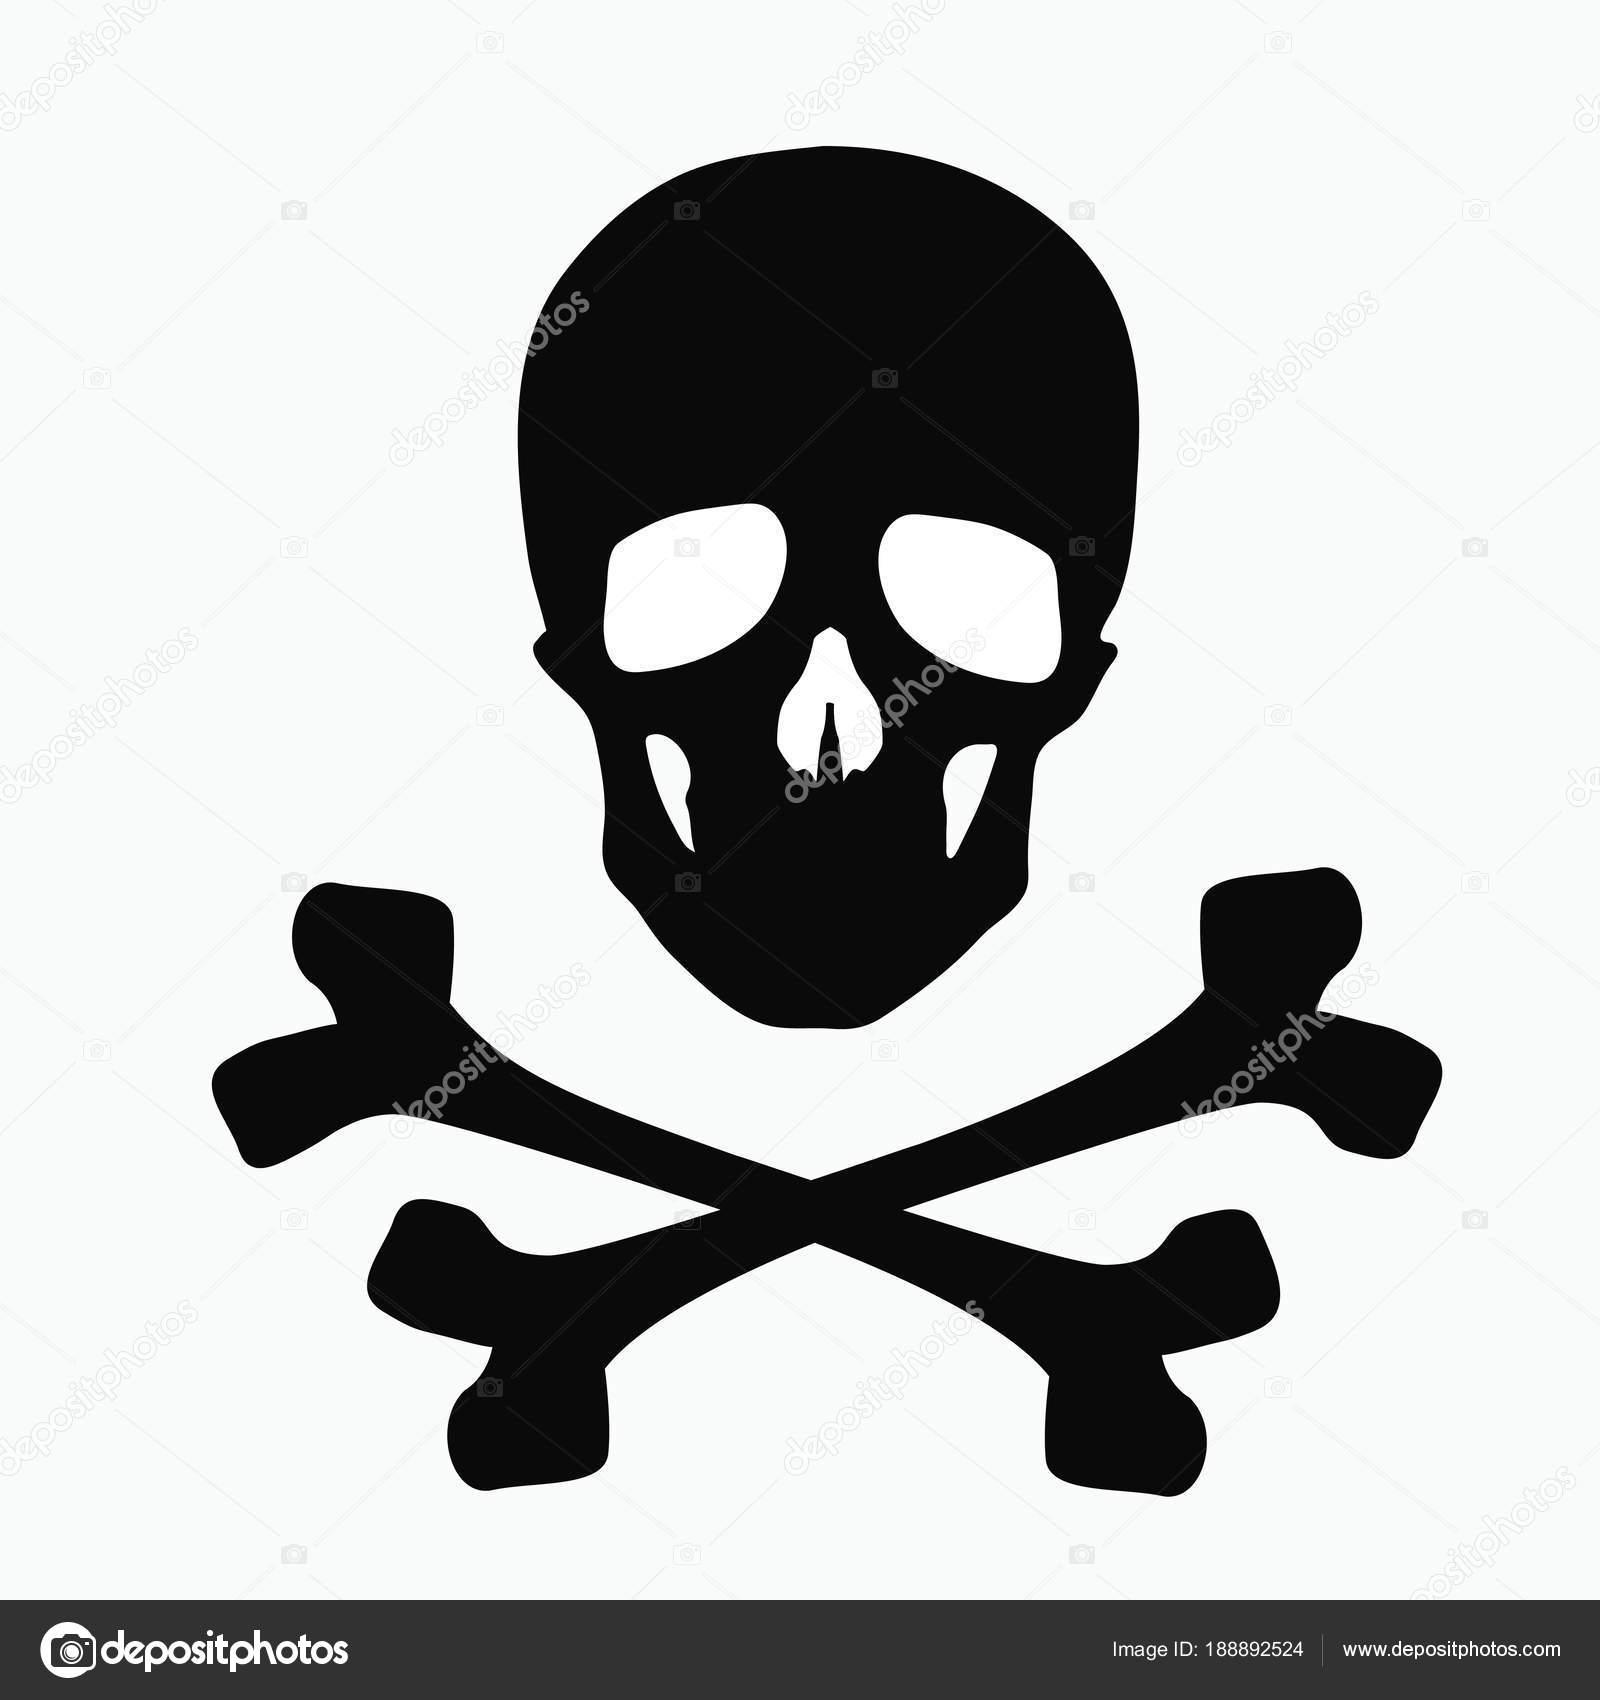 Skull And Bones A Sign Of Danger Illustration Isolated On White